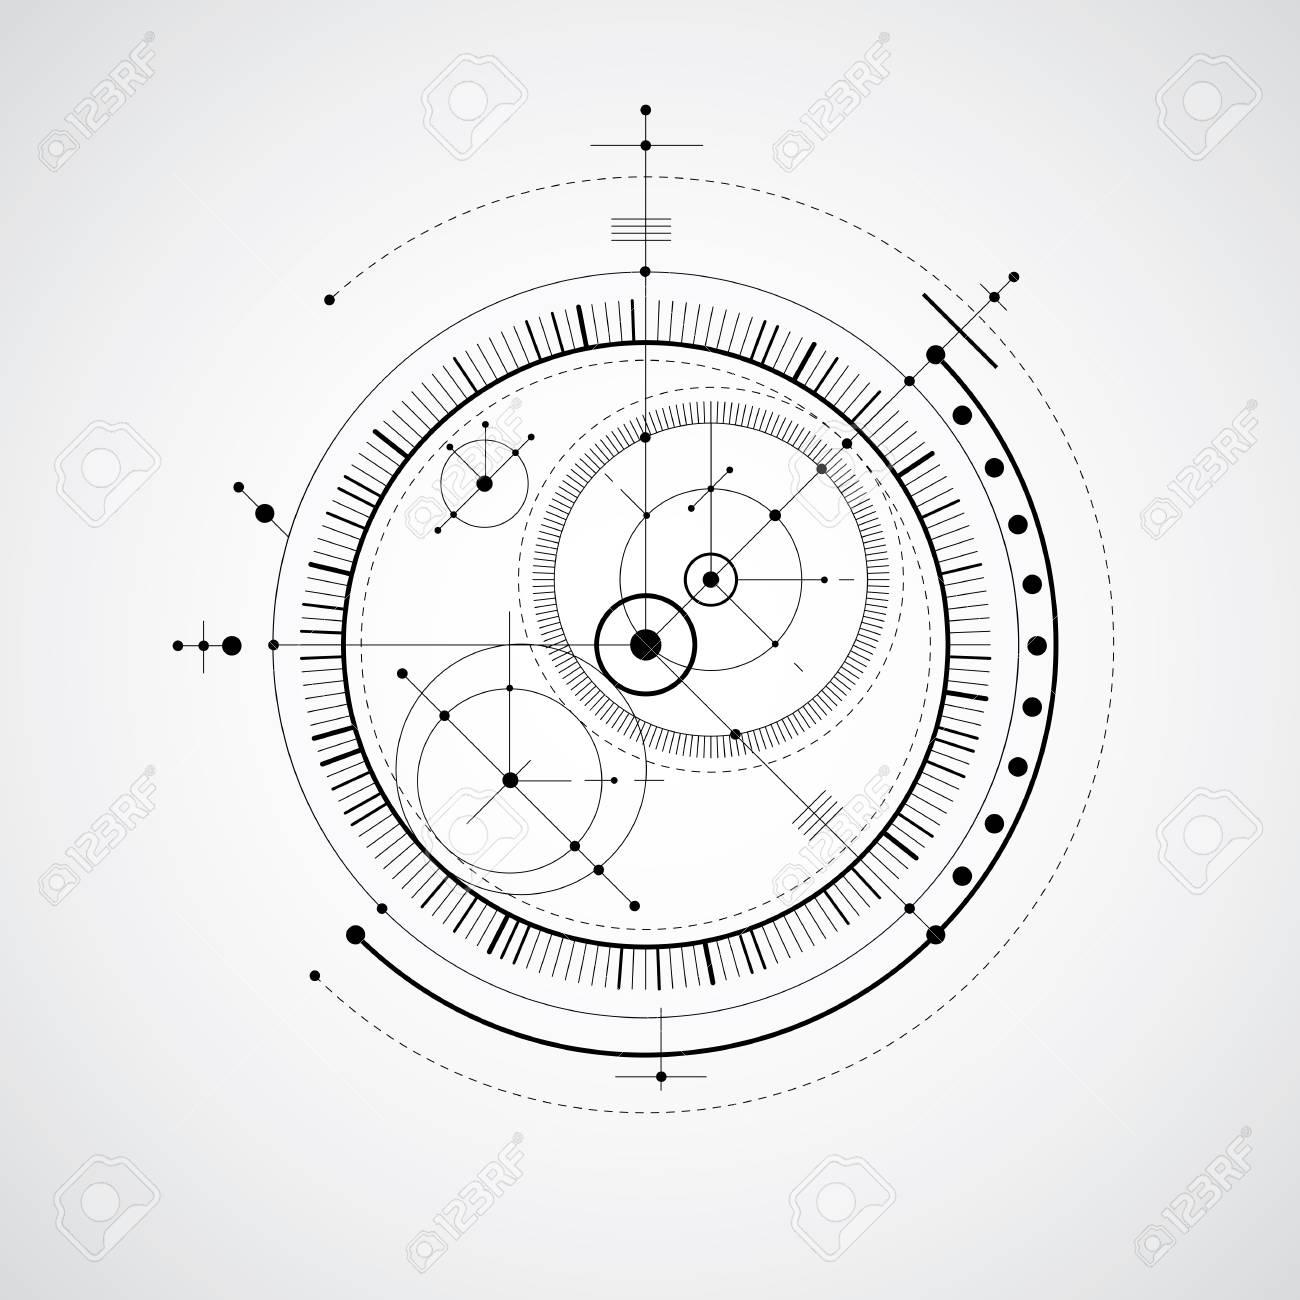 Enchanting Draw Scheme Online Component - Electrical Diagram Ideas ...